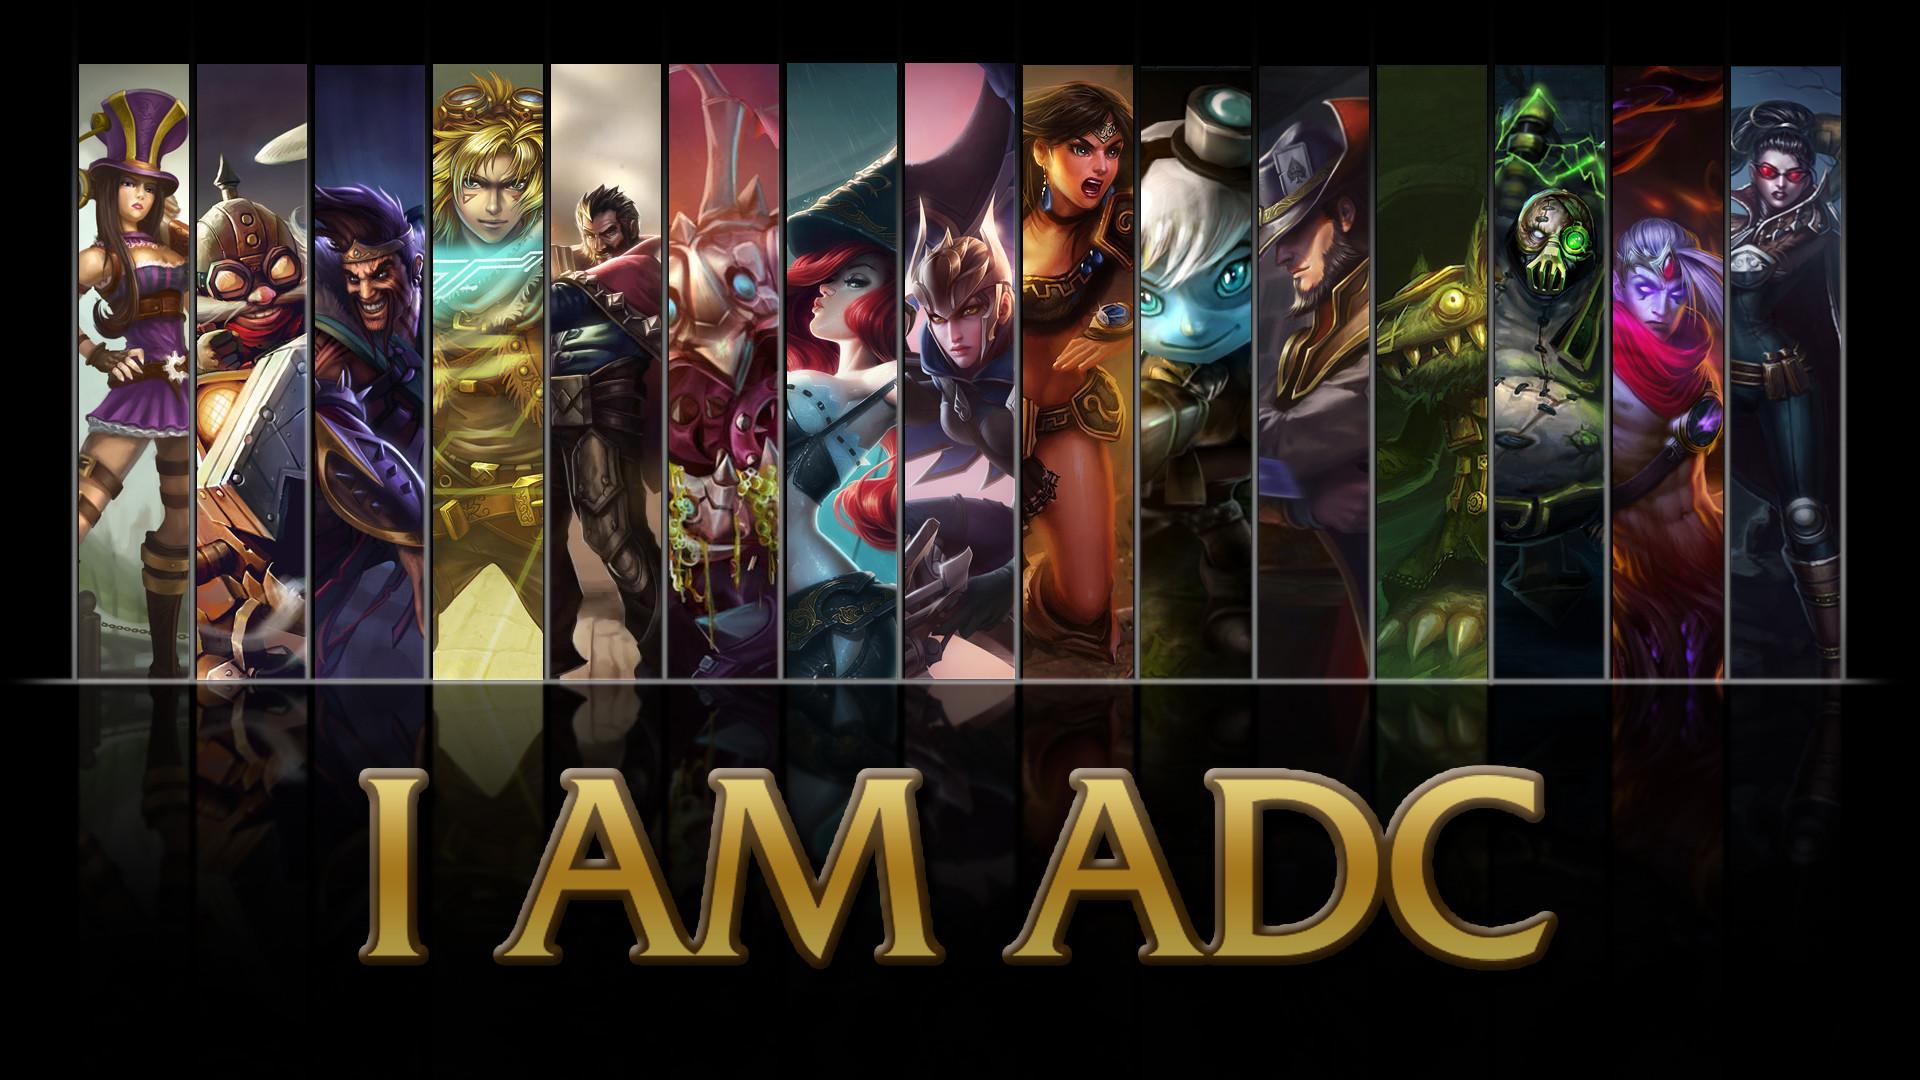 … NibblesMeKibbles League of Legends I AM ADC wallpaper by  NibblesMeKibbles